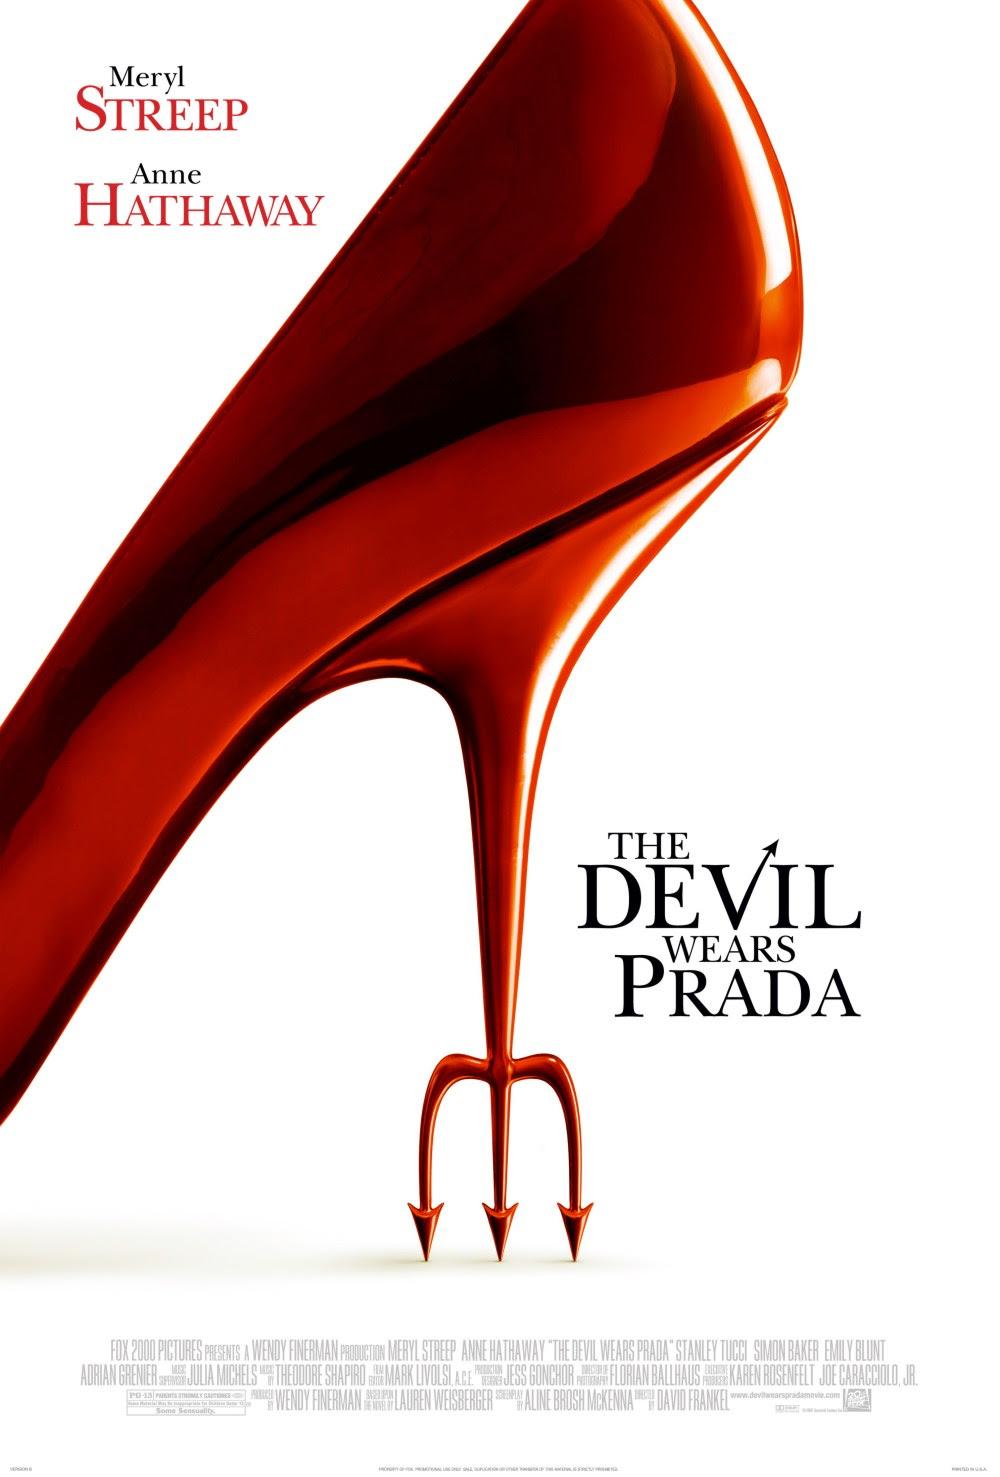 http://www.themoviemind.com/wp-content/uploads/2007/11/devil-wears-prada.jpg